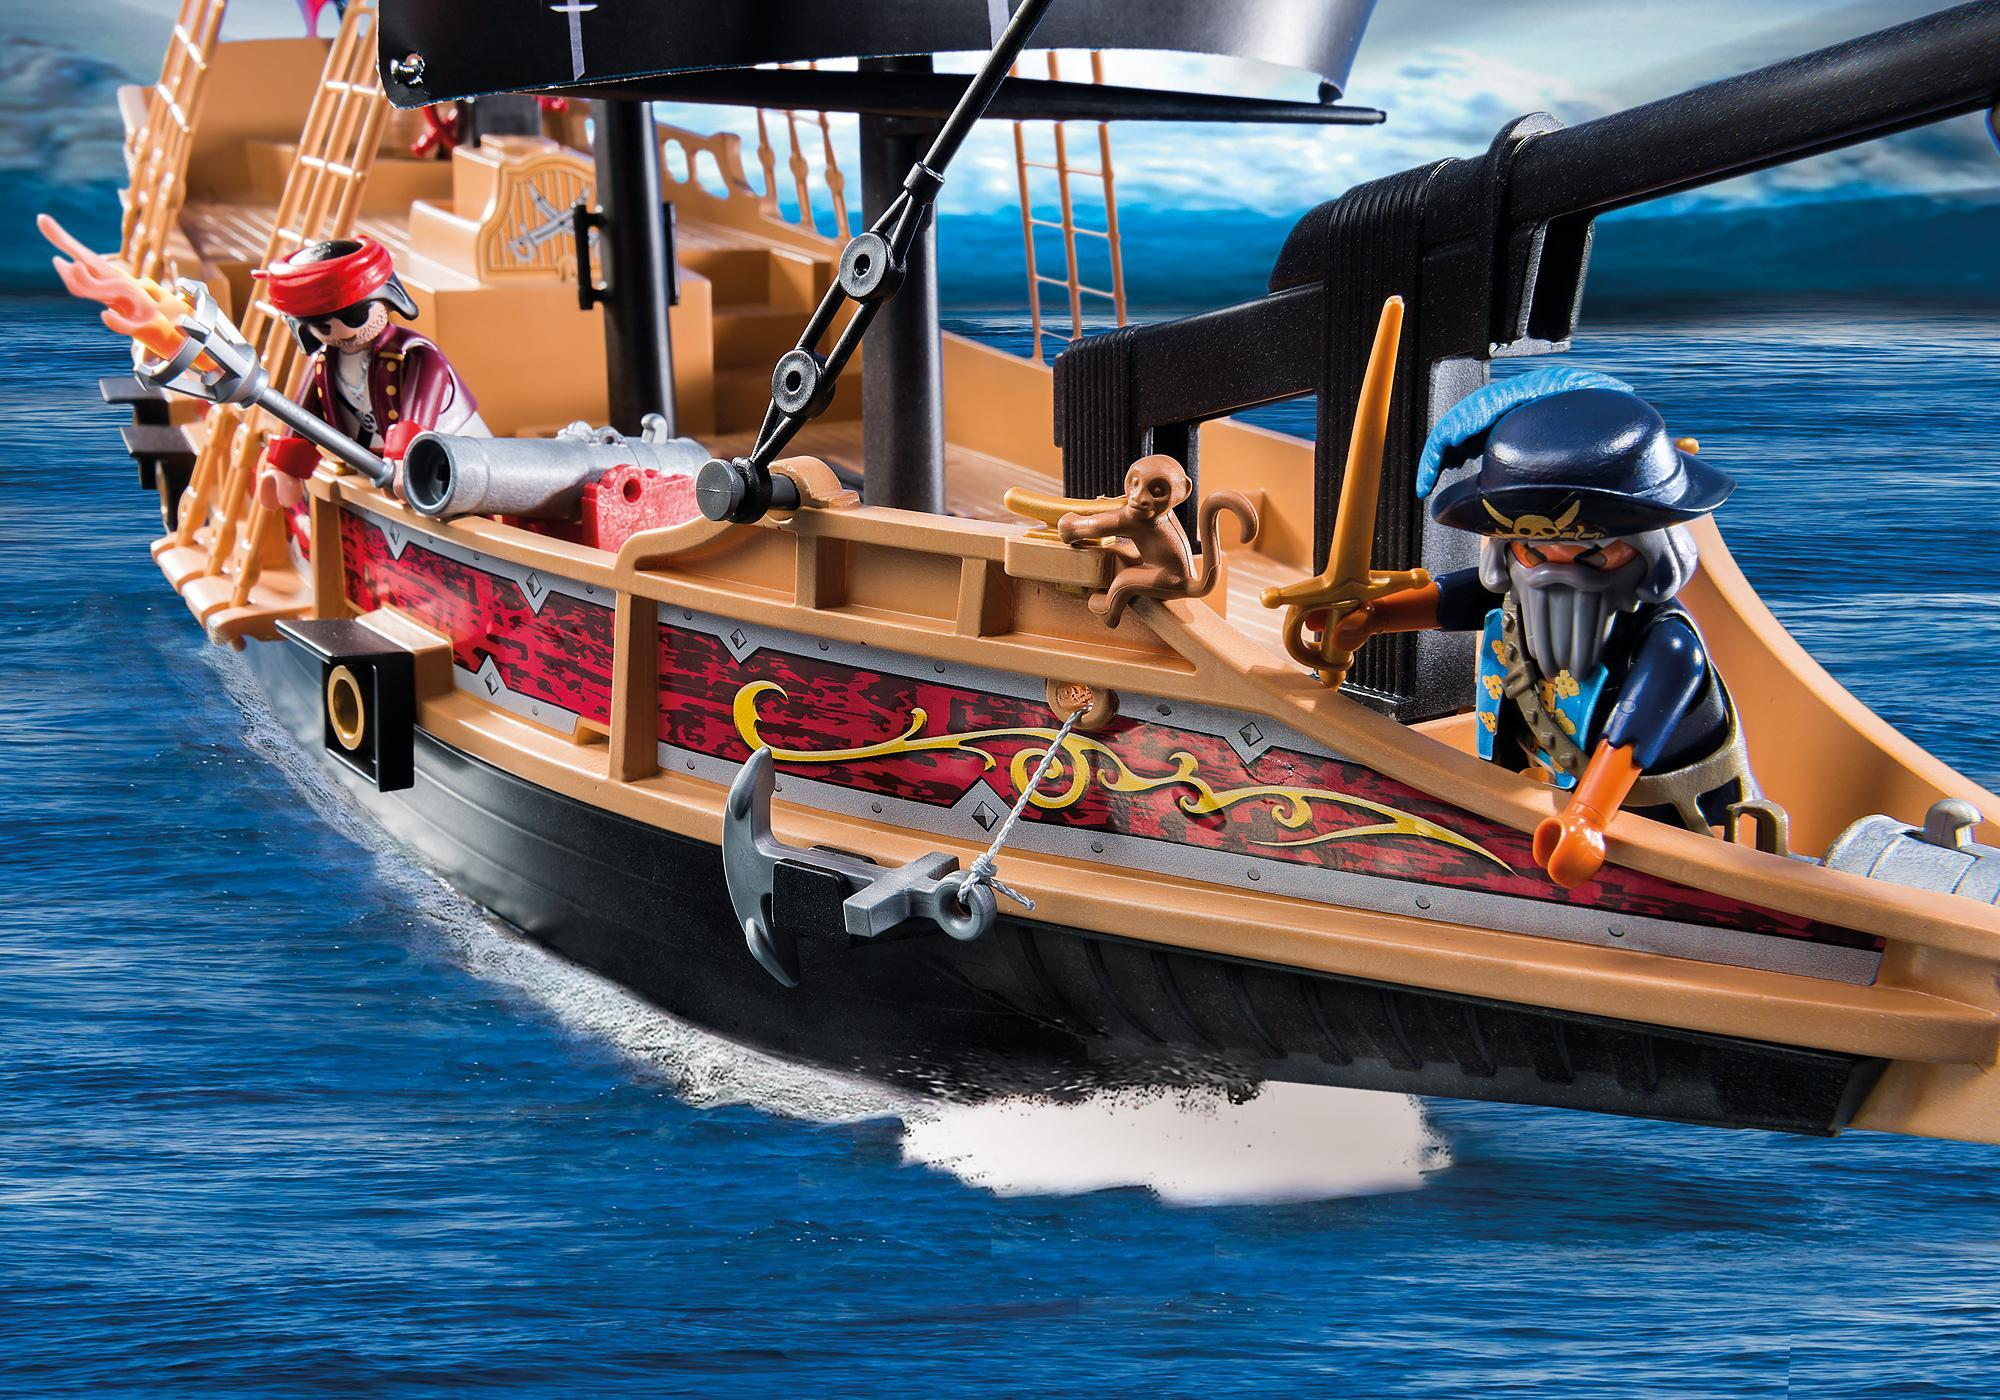 http://media.playmobil.com/i/playmobil/6678_product_extra3/Pirate Raiders' Ship